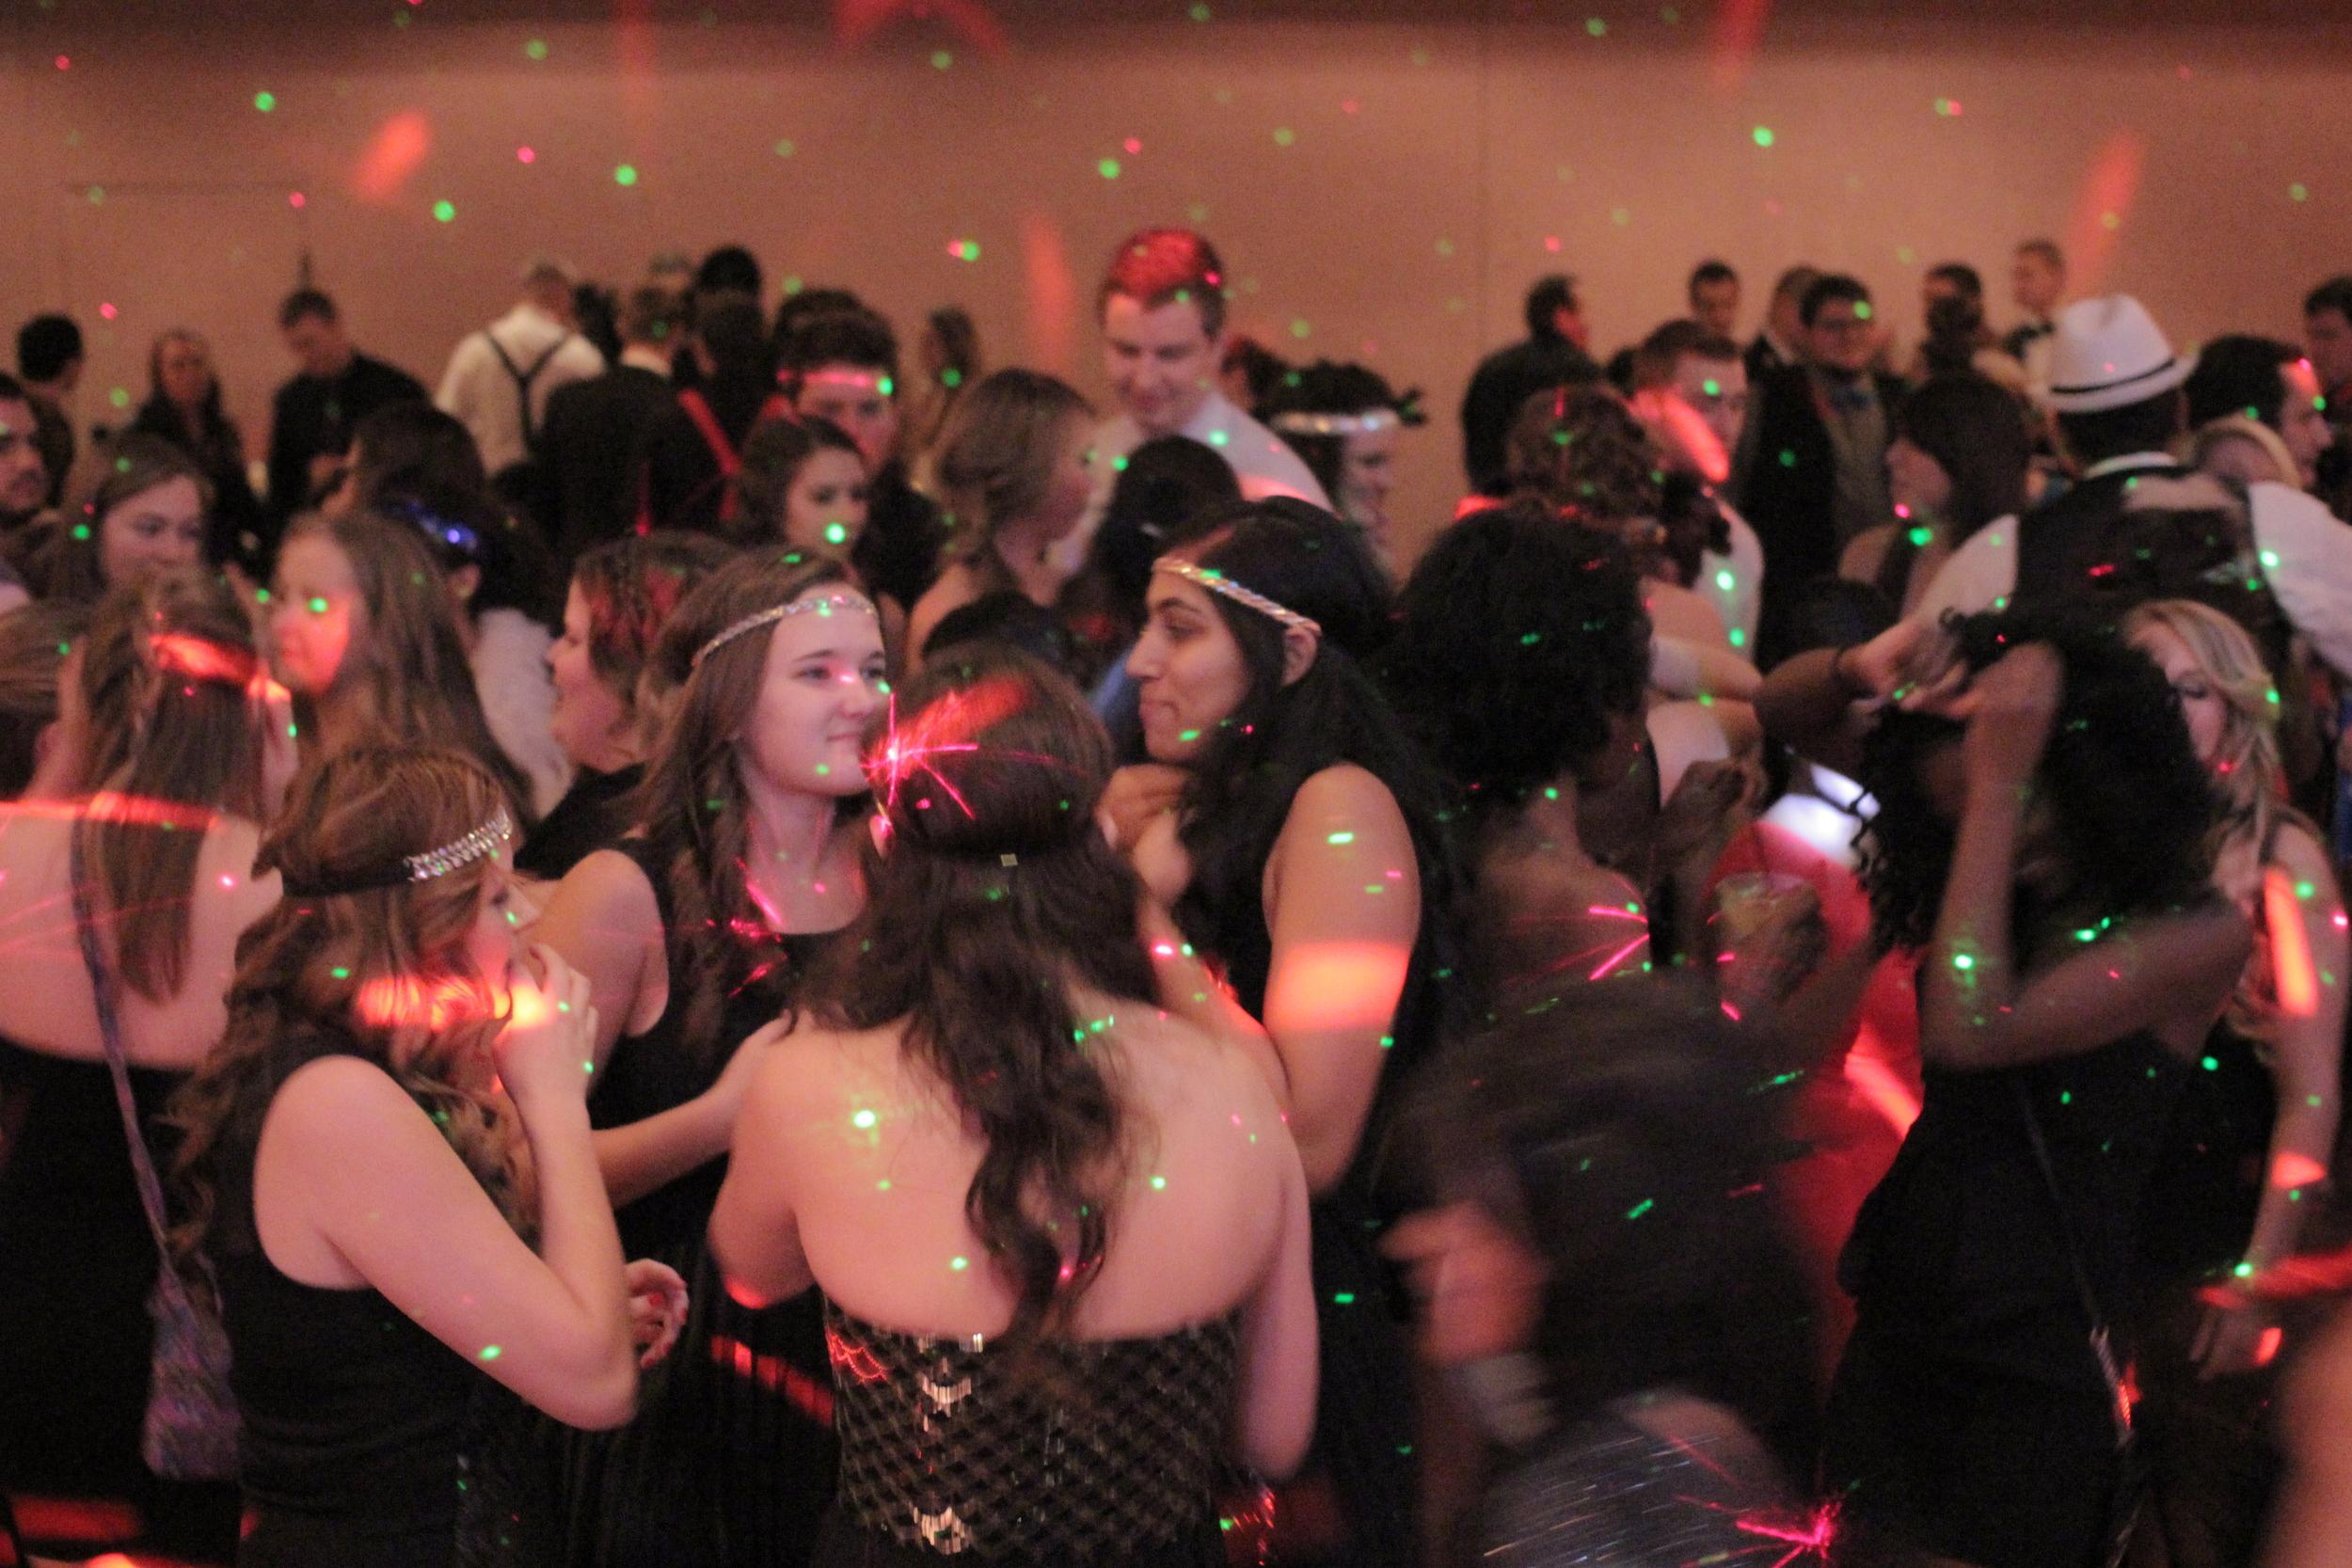 Sure Tones Entertainment   dance party with active laser lights